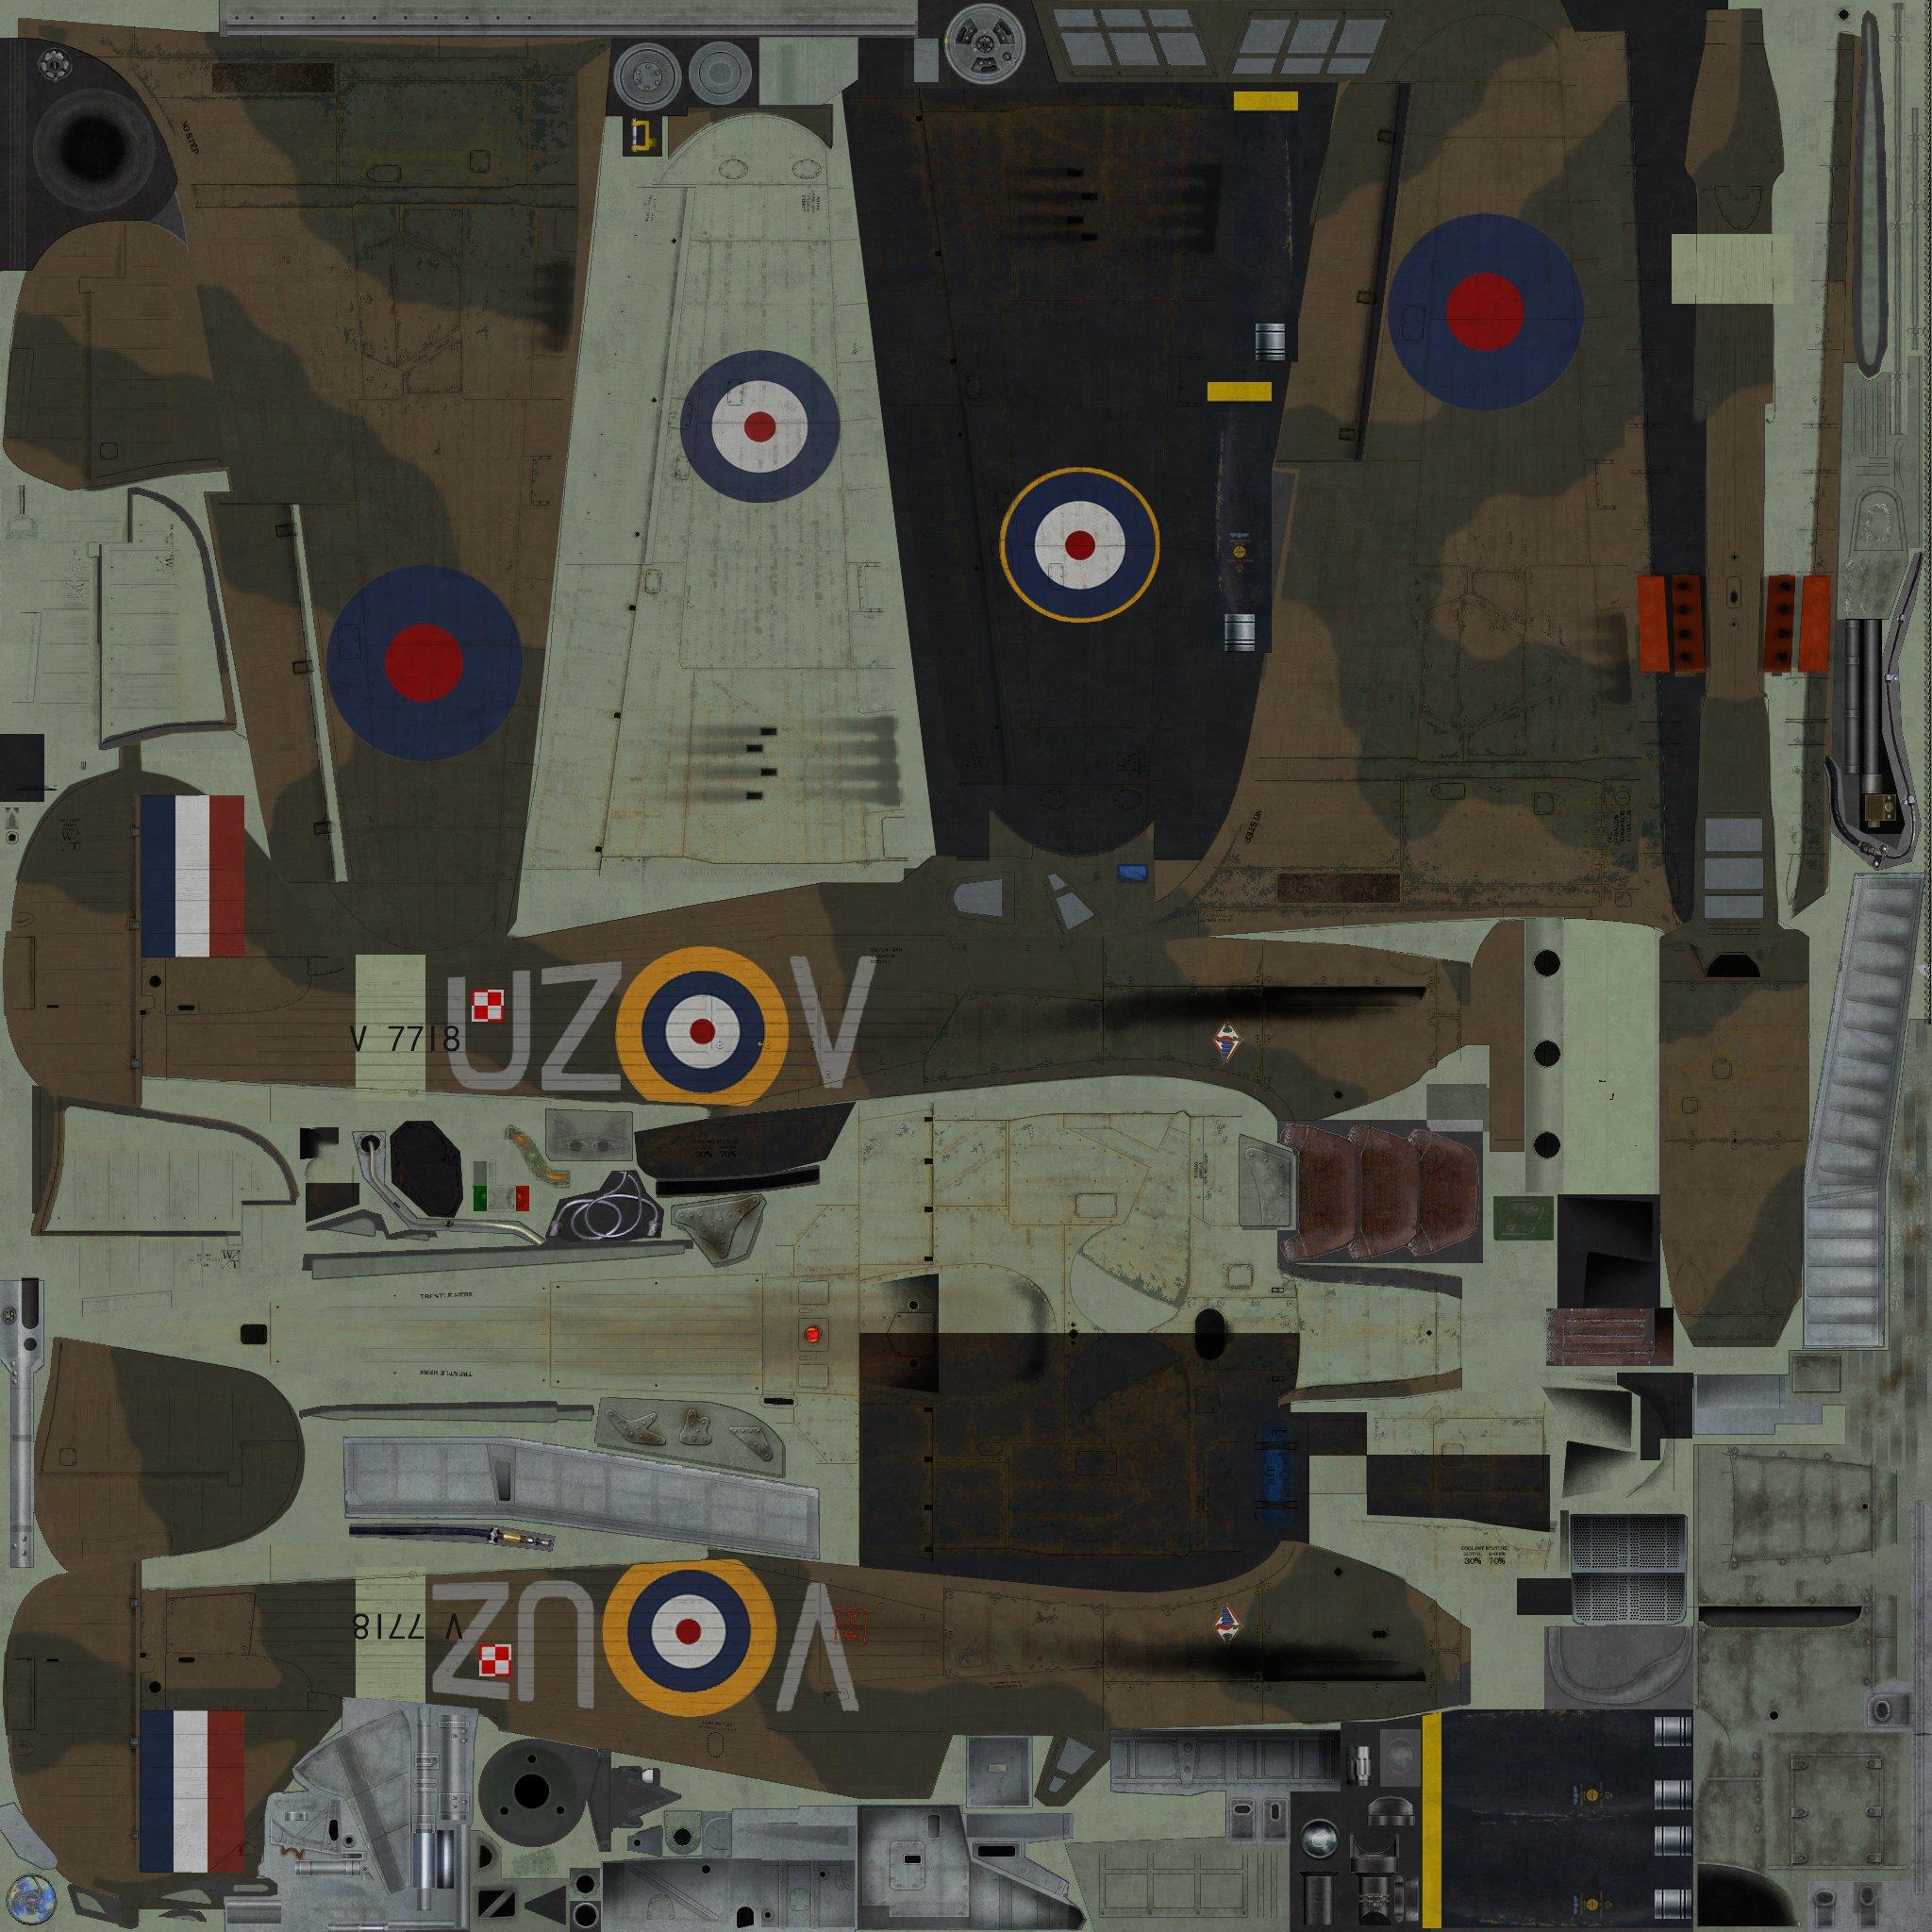 COD YY Hurricane I RAF 306Sqn UZV V7118 Ternhill England 1941 01